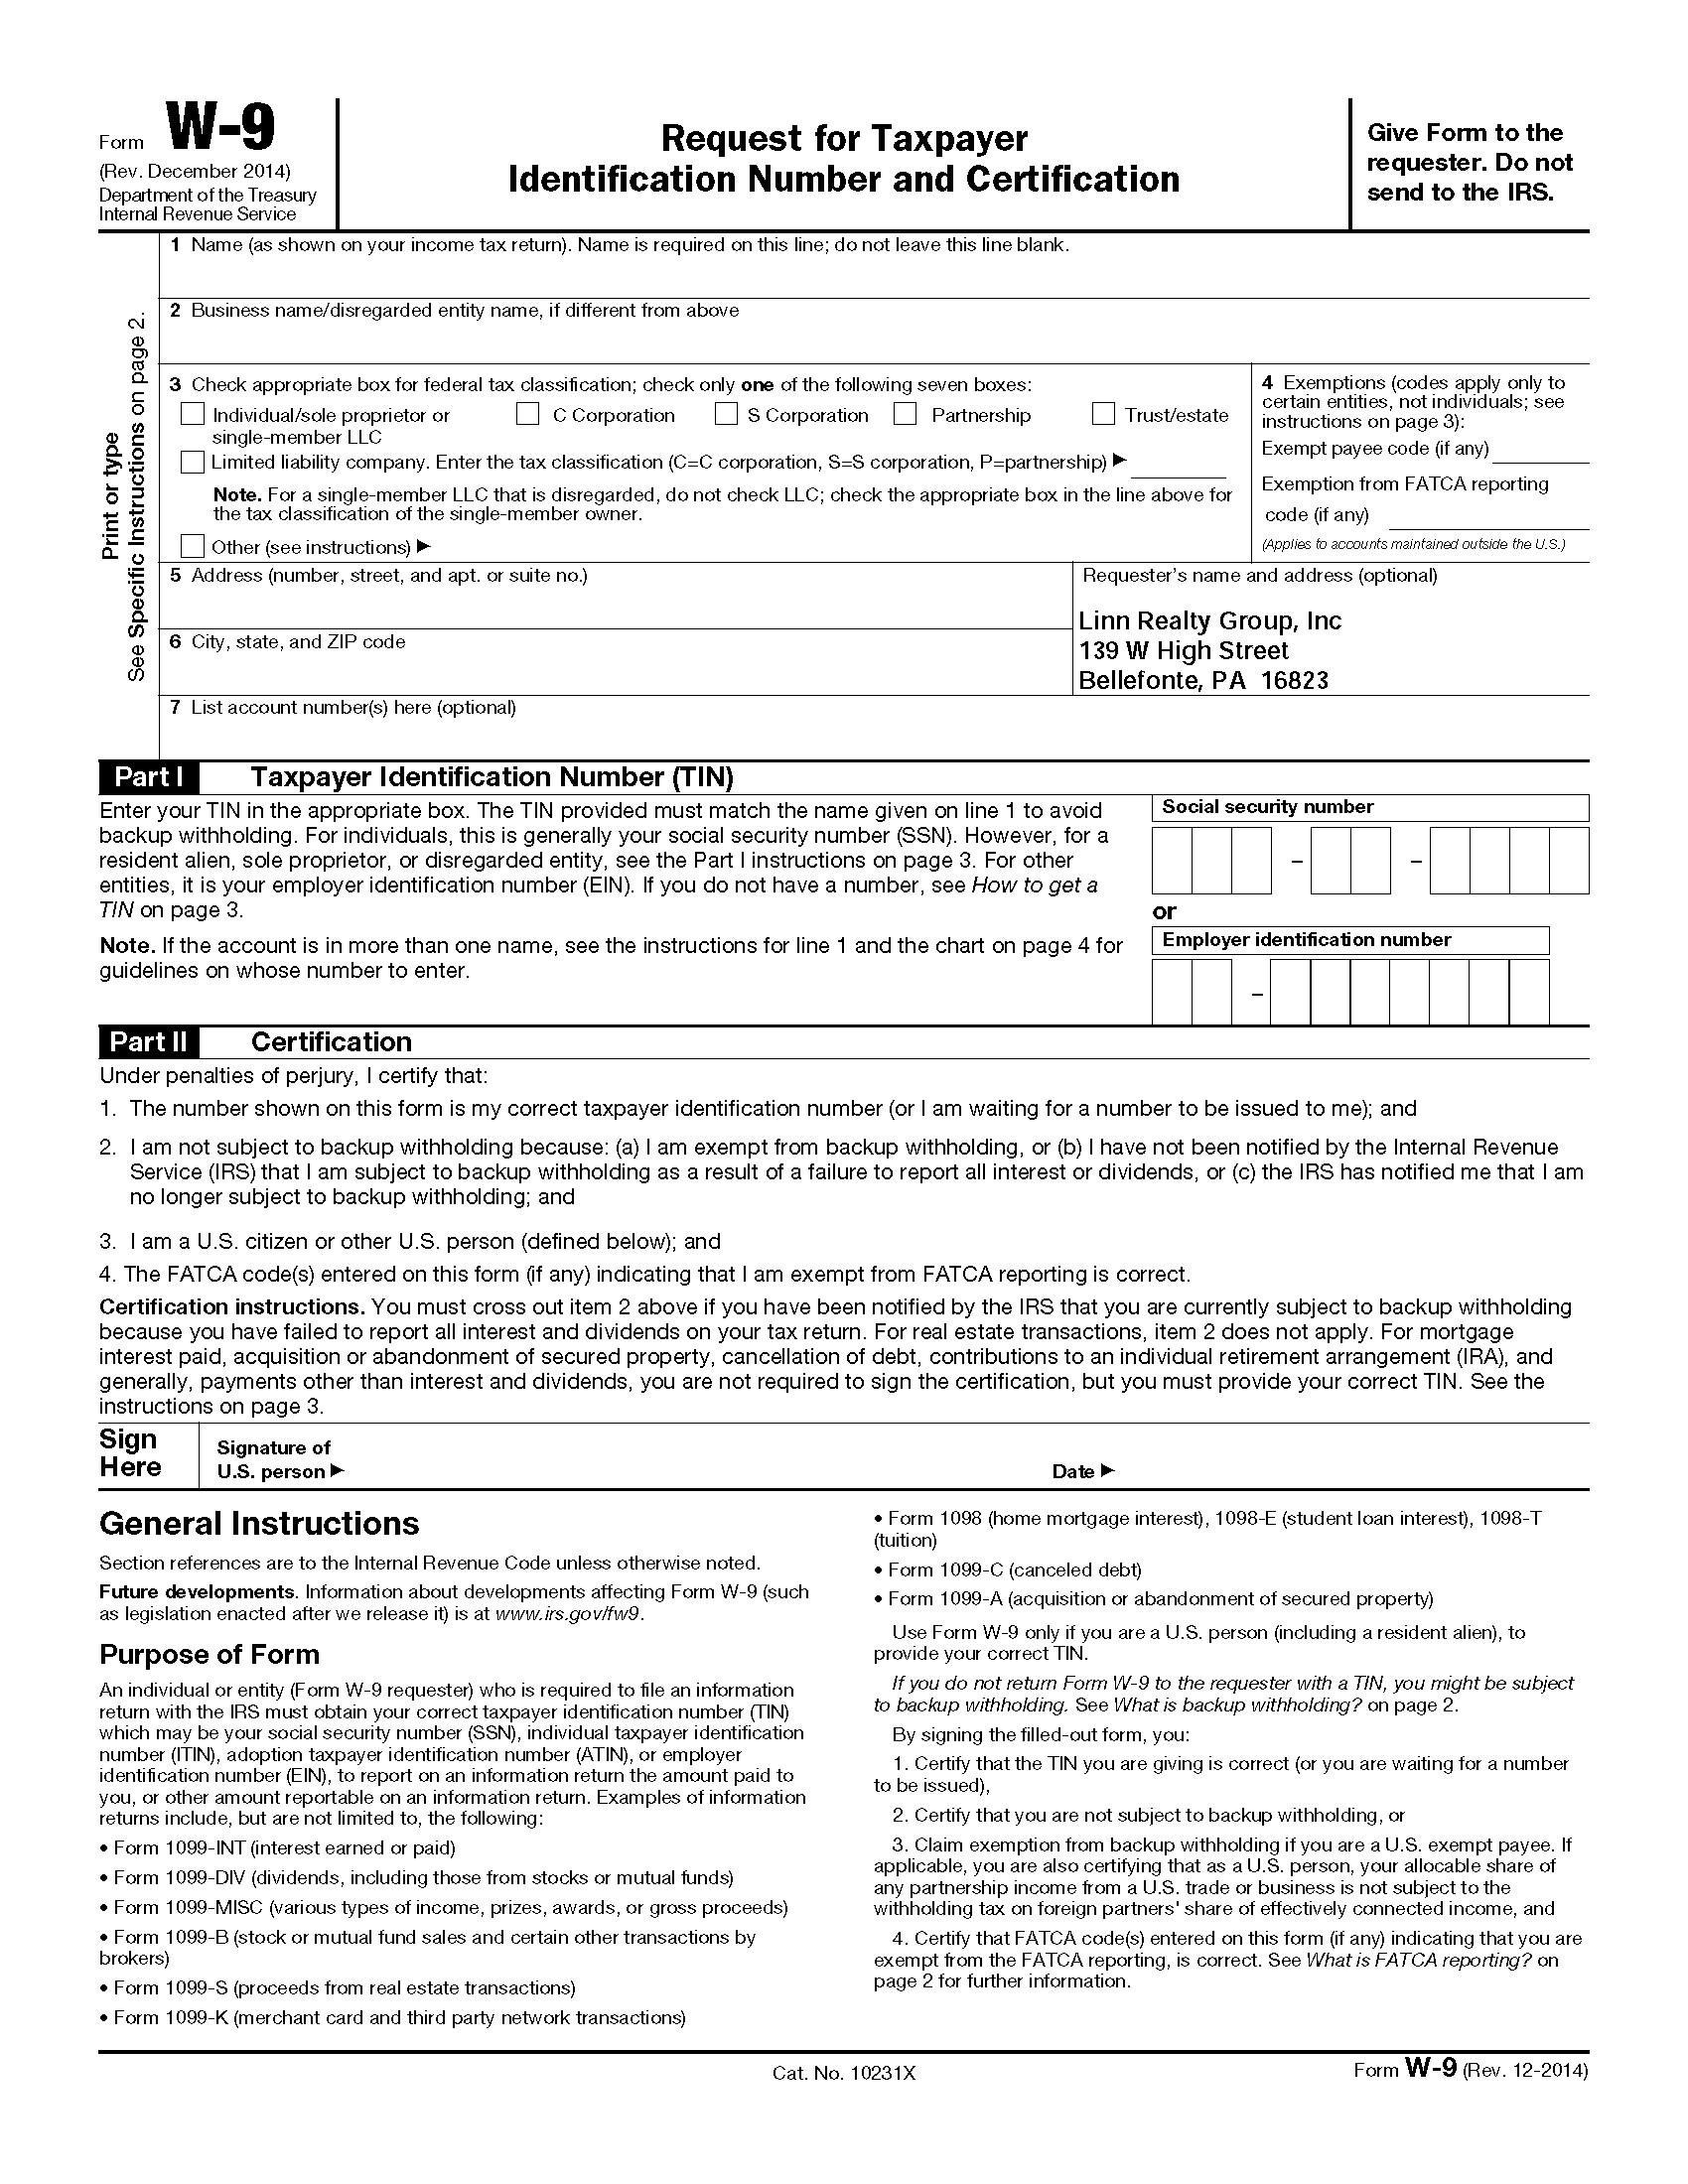 Blank 2019 W 9 Form Printable | Calendar Template Printable-Irs Blank W 9 Form 2020 Printable